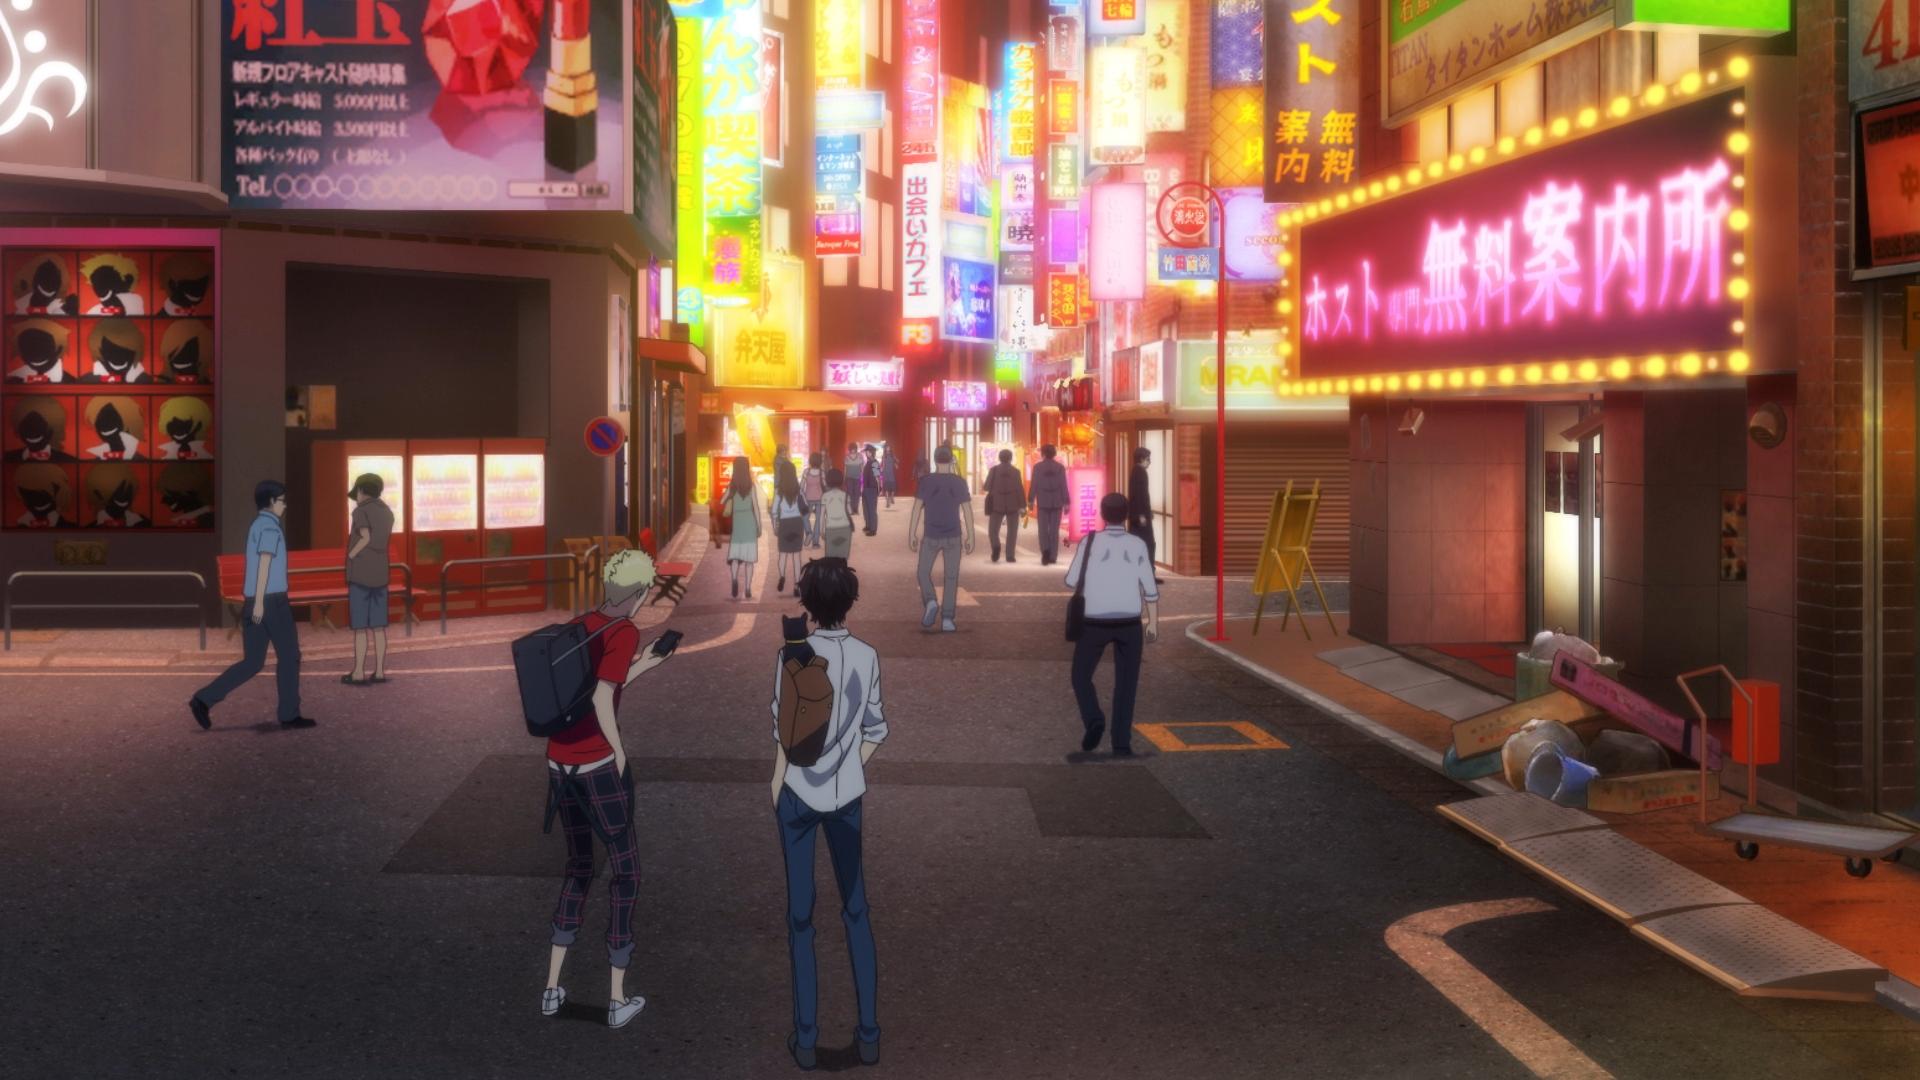 TVアニメ『ペルソナ5』第10話先行カット&あらすじ公開! 蓮、竜司、杏の三人はテレビ局で高校生名探偵・明智吾郎と遭遇する